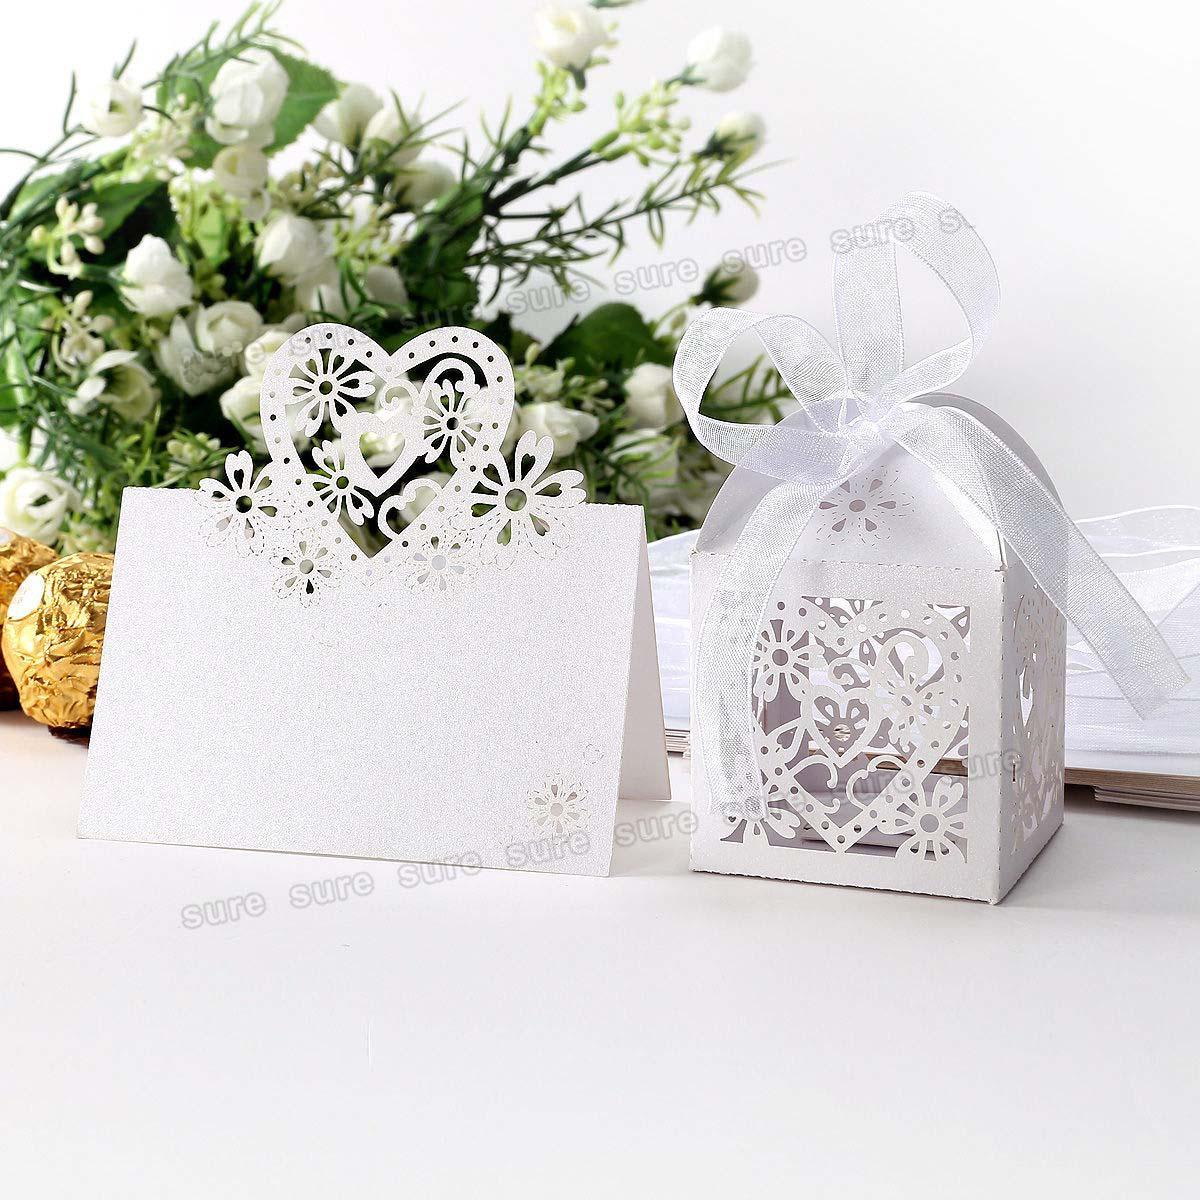 Wedding Favor Boxes Trinidad : Laser cut filigree love heart wedding favor boxes